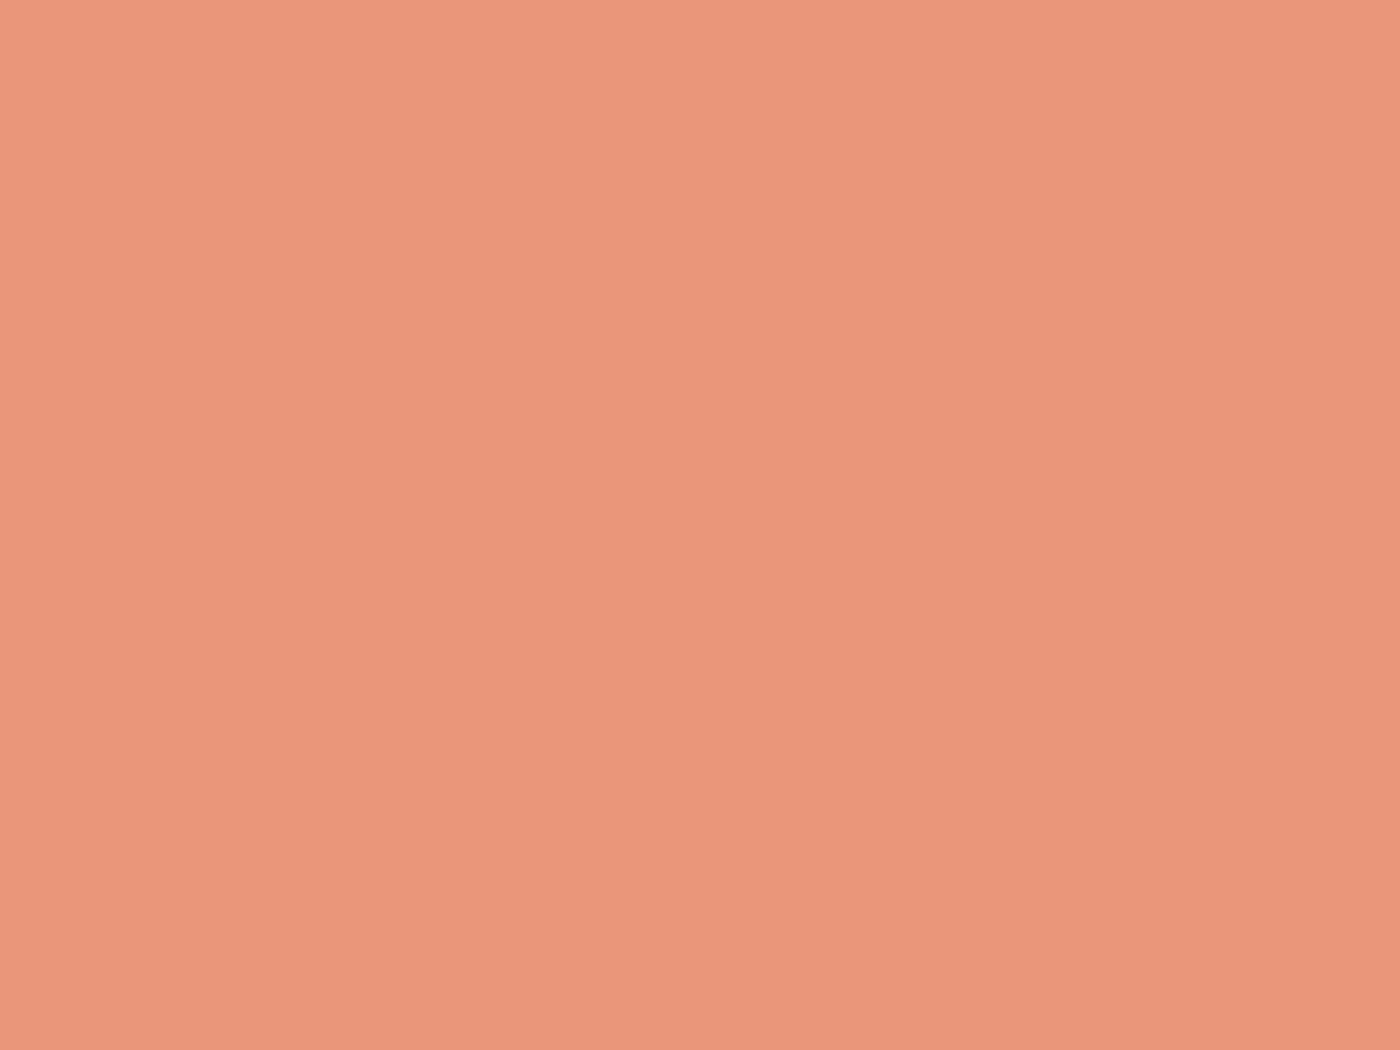 1400x1050 Dark Salmon Solid Color Background